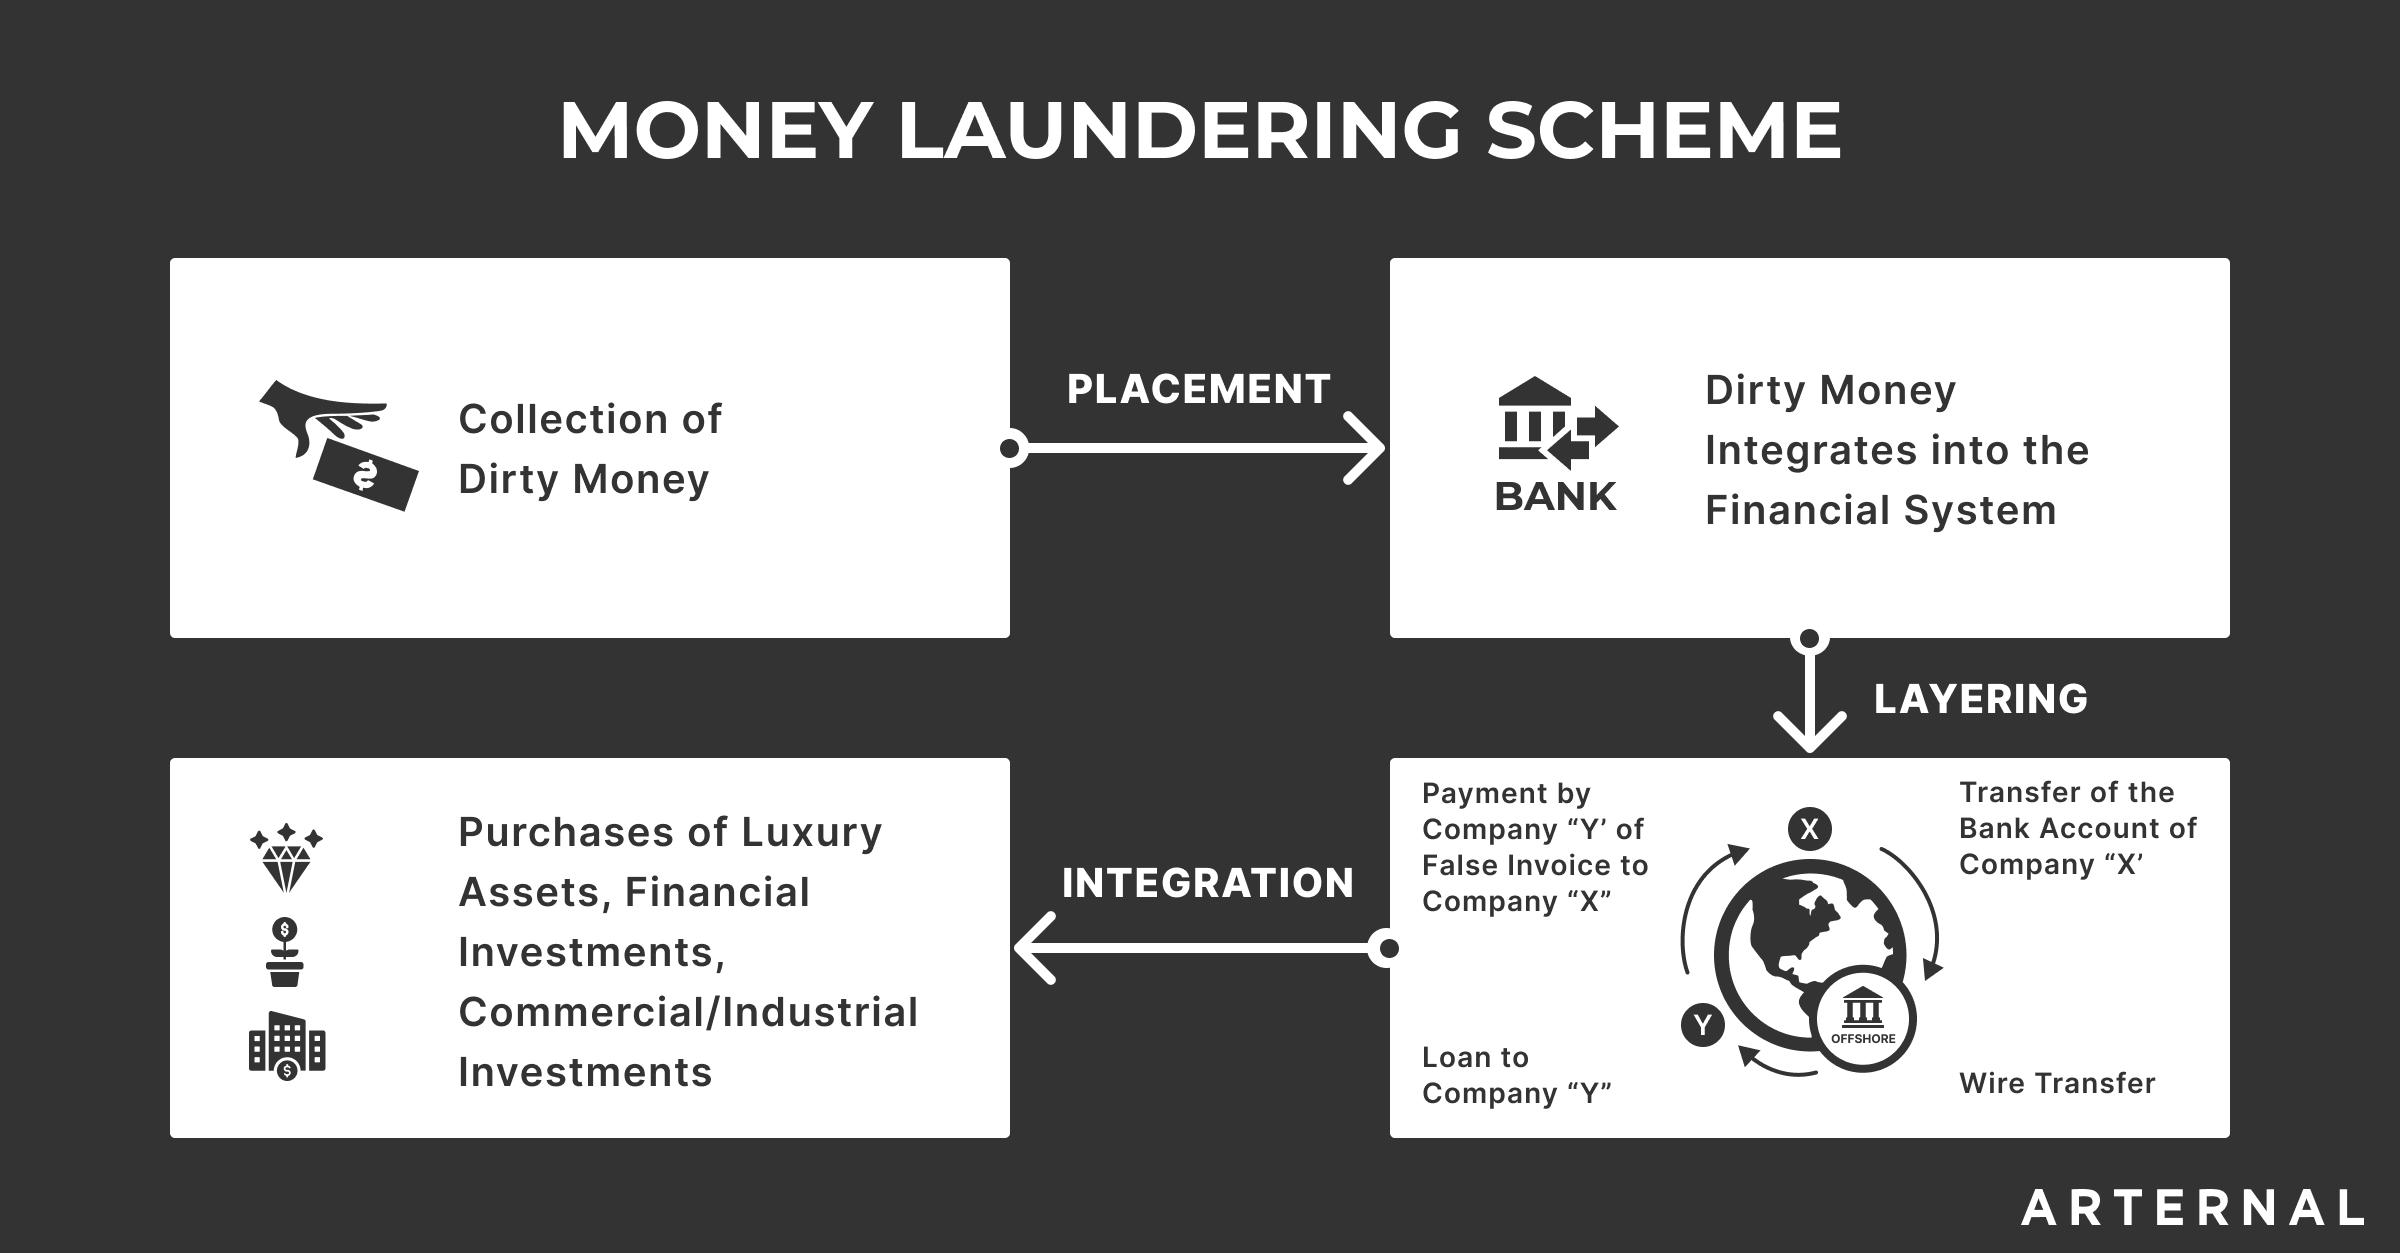 ARTERNAL - anti money laundering scheme image